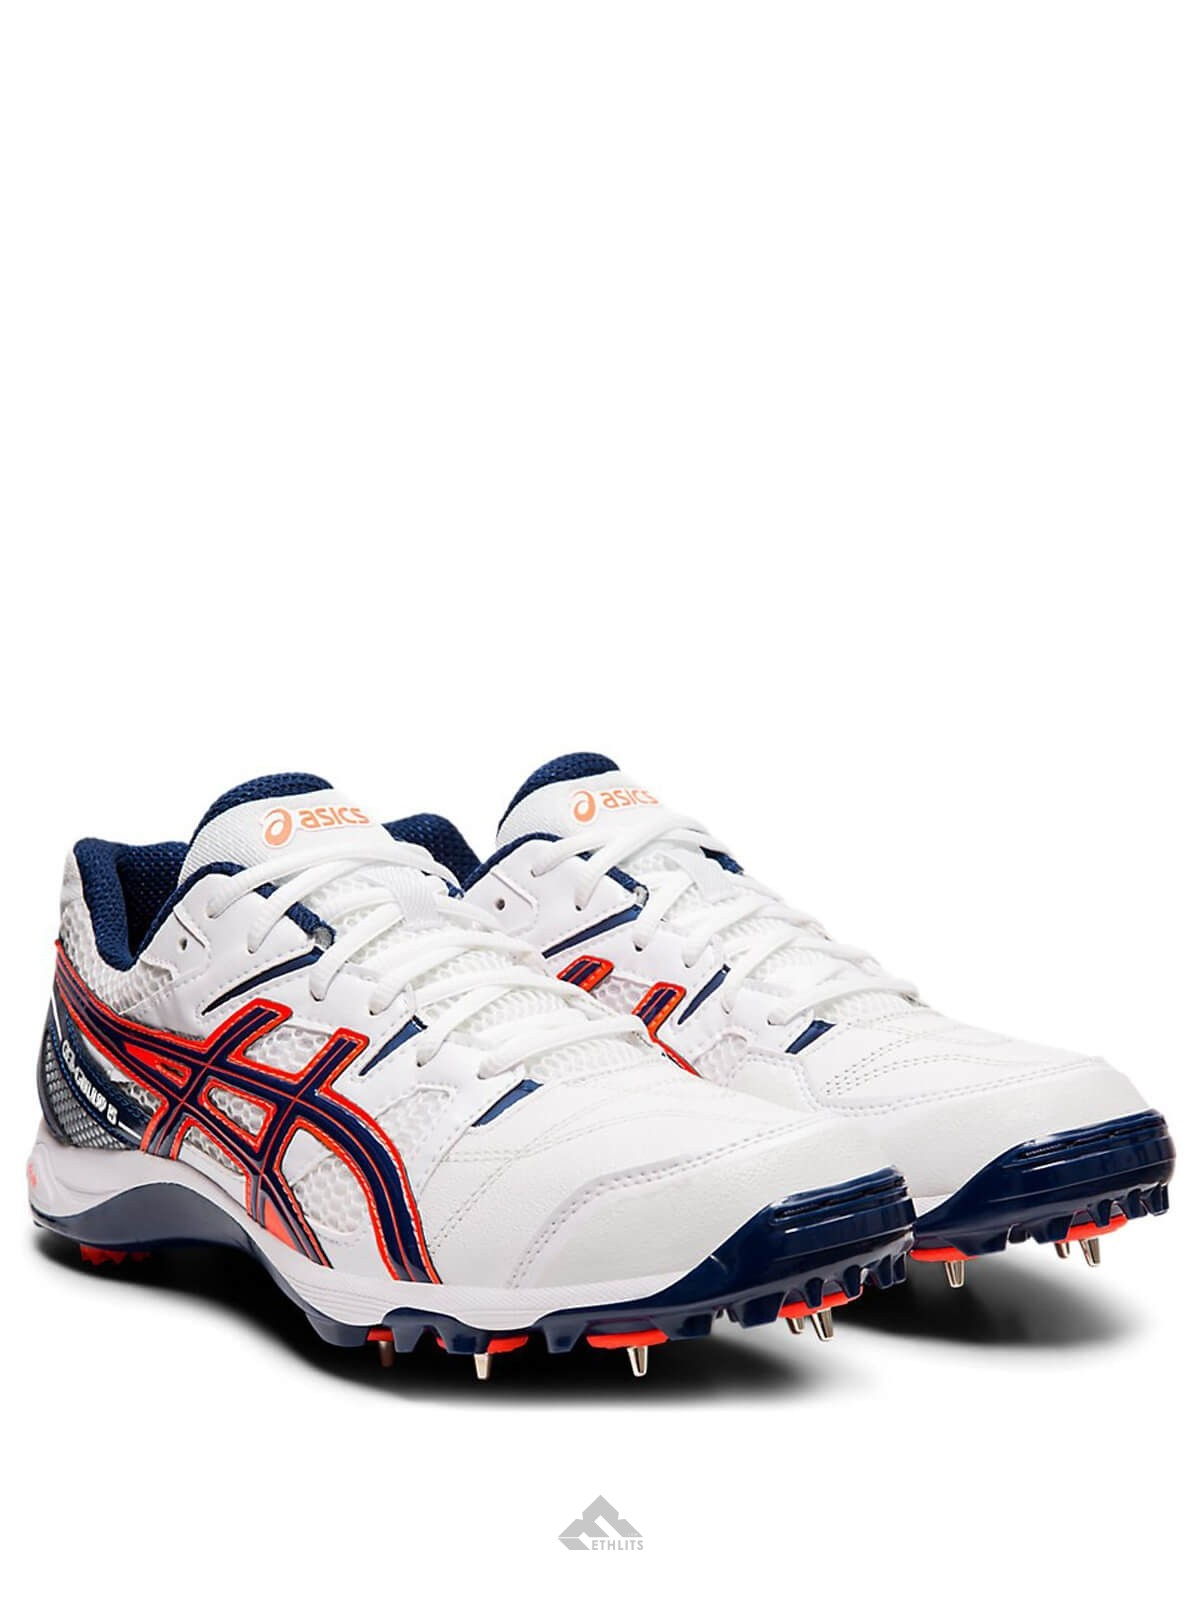 Buy Asics Gel Gully 5 WhiteBlue Expanse Cricket Spike Shoes